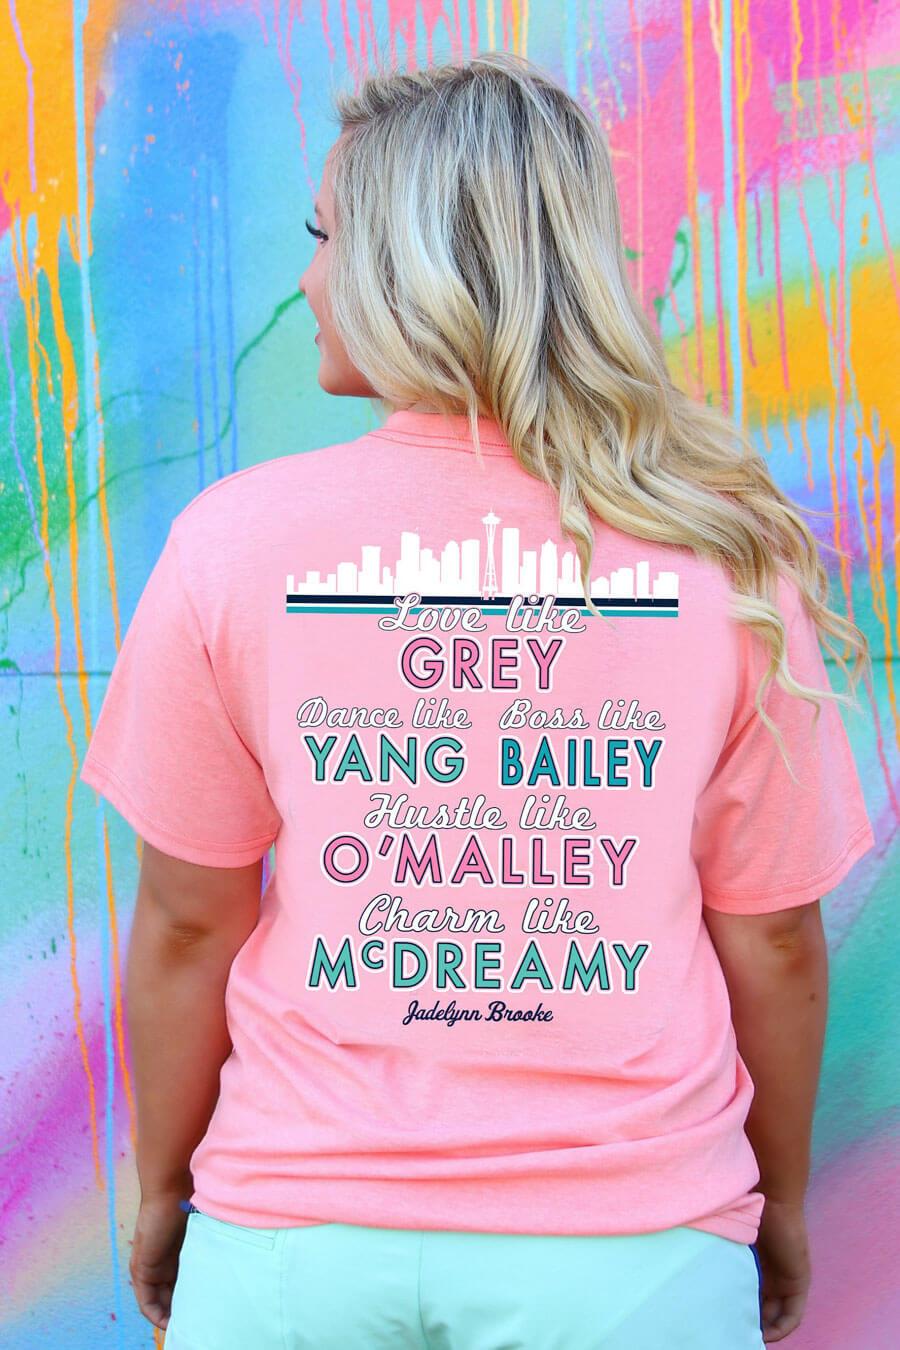 Atlanta Braves Shirts For Women